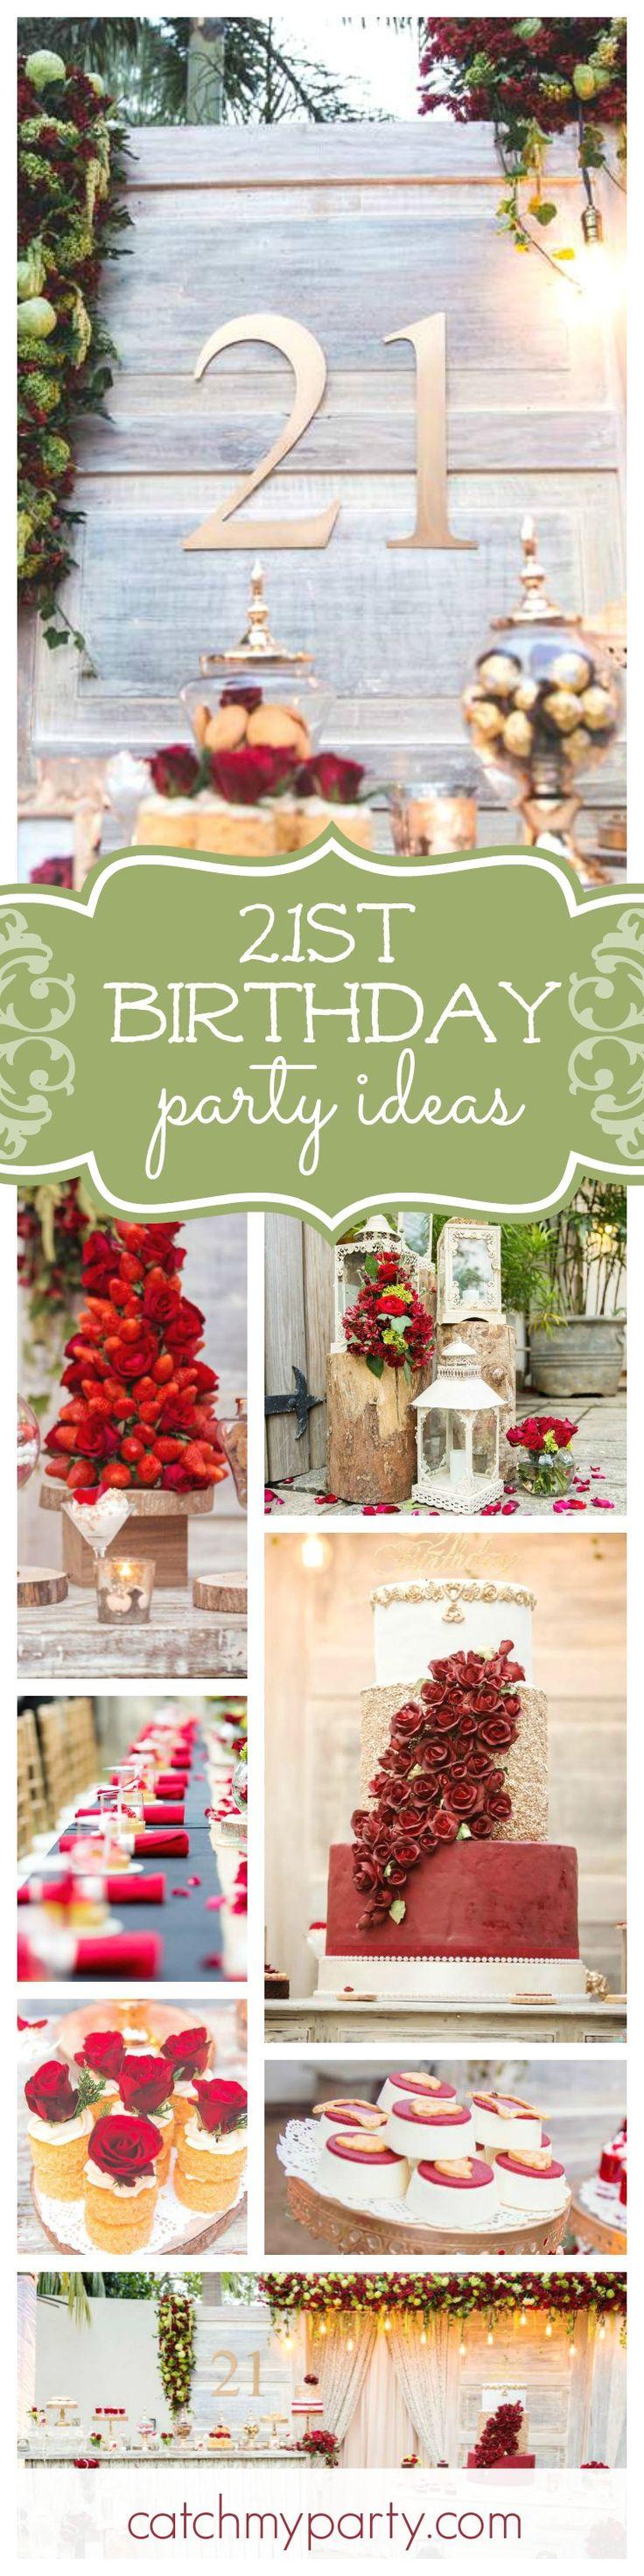 Rustic Vintage Theme Birthday Avishis 21st